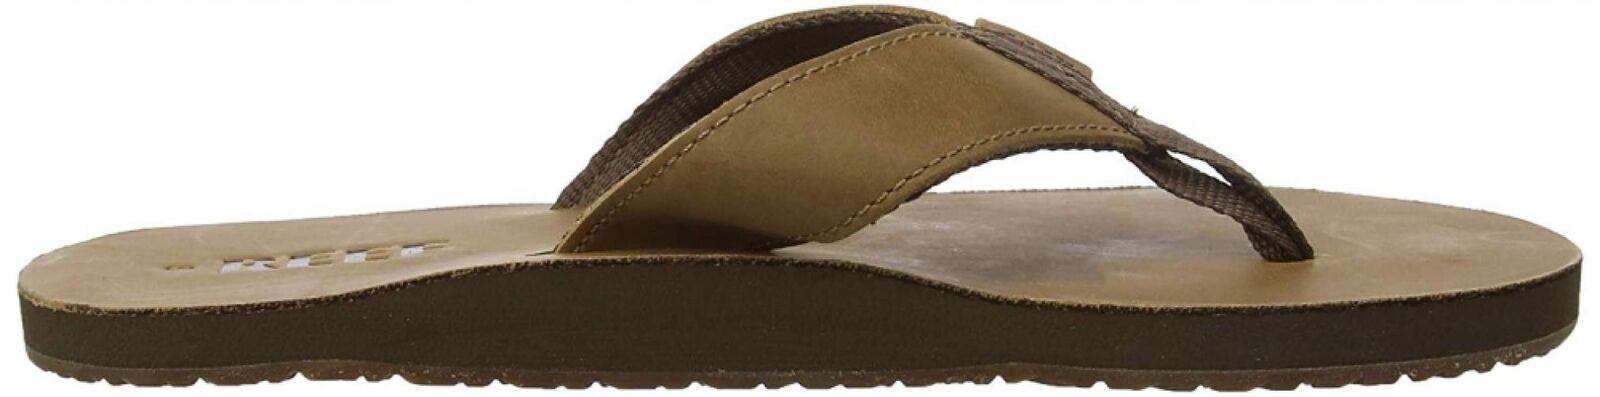 Haflinger Wouomo Smoothy Smoothy Smoothy Thong Sandal 692e89